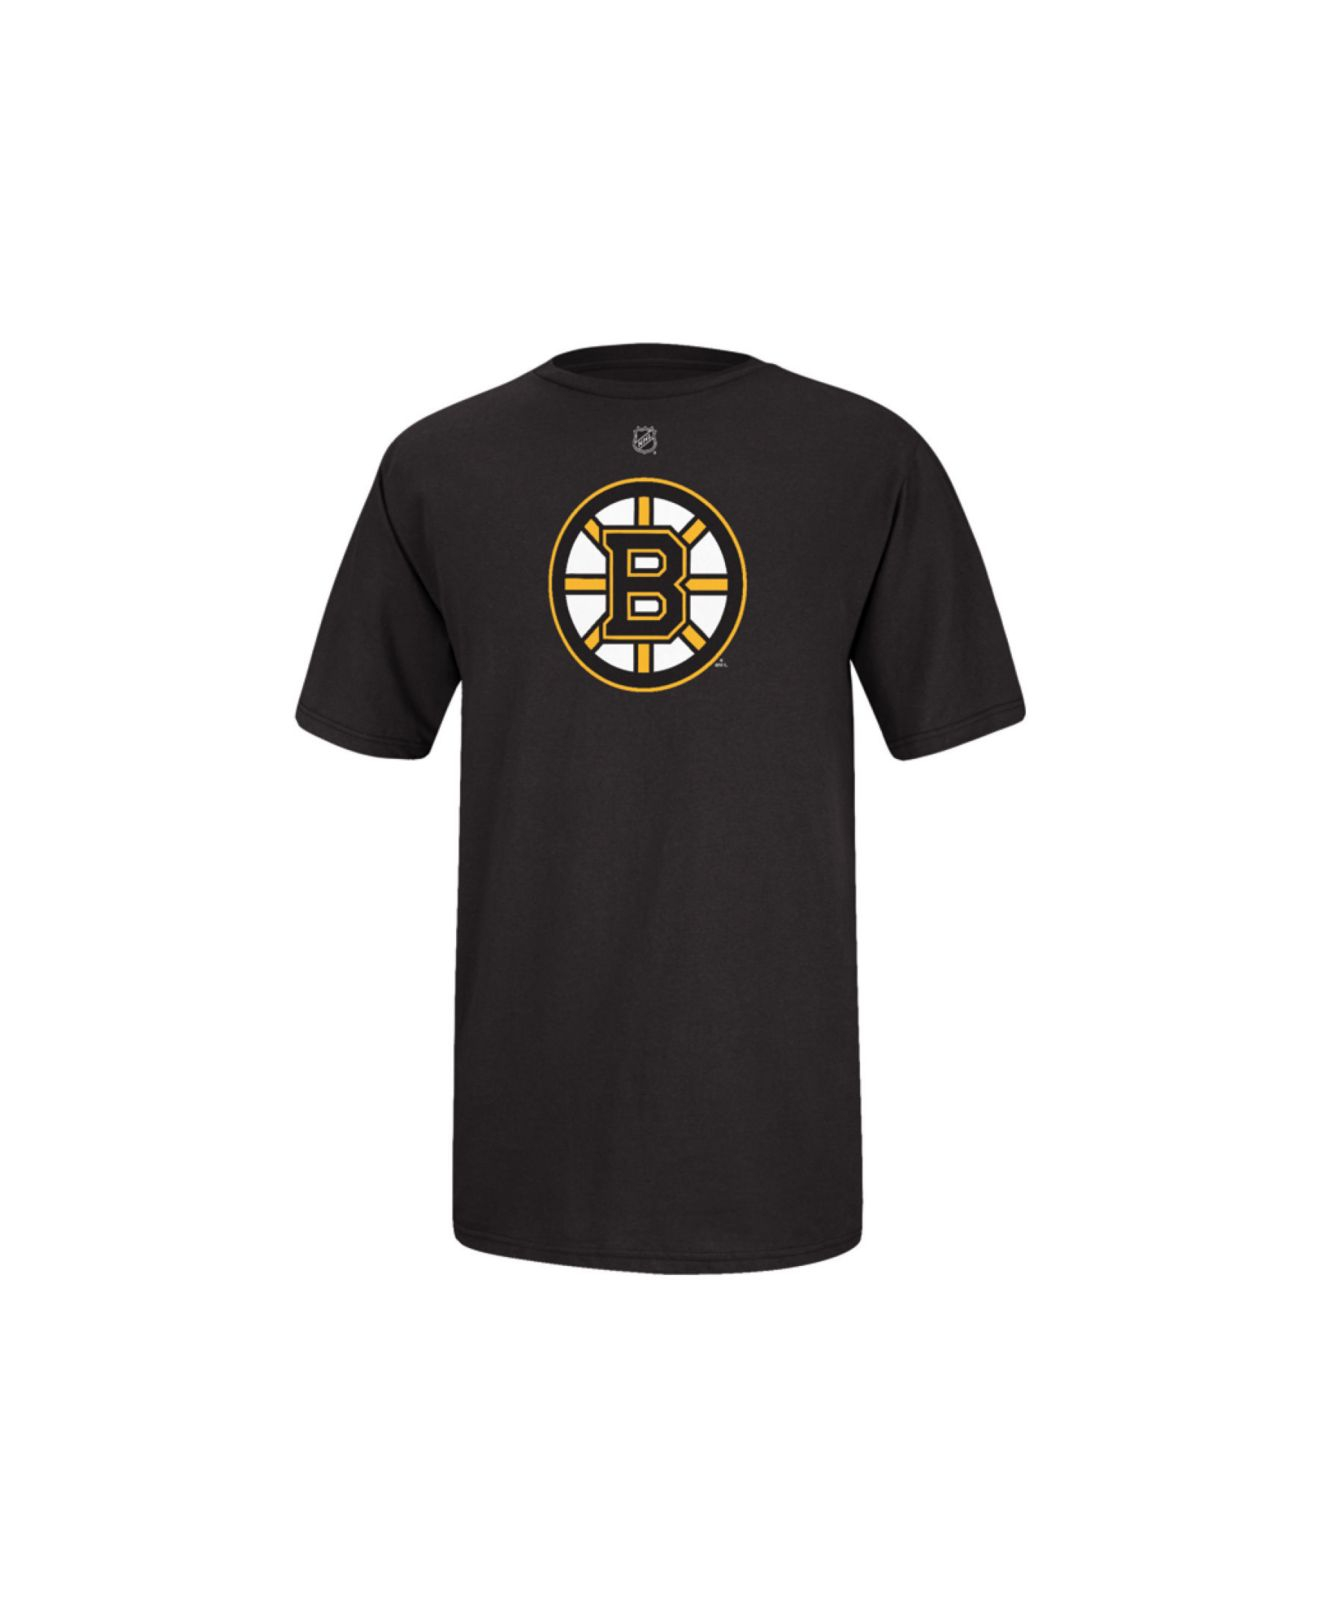 7ead41da469 Reebok - Black Men s Short-sleeve Gregory Campbell Boston Bruins Nhl Player  T-shirt